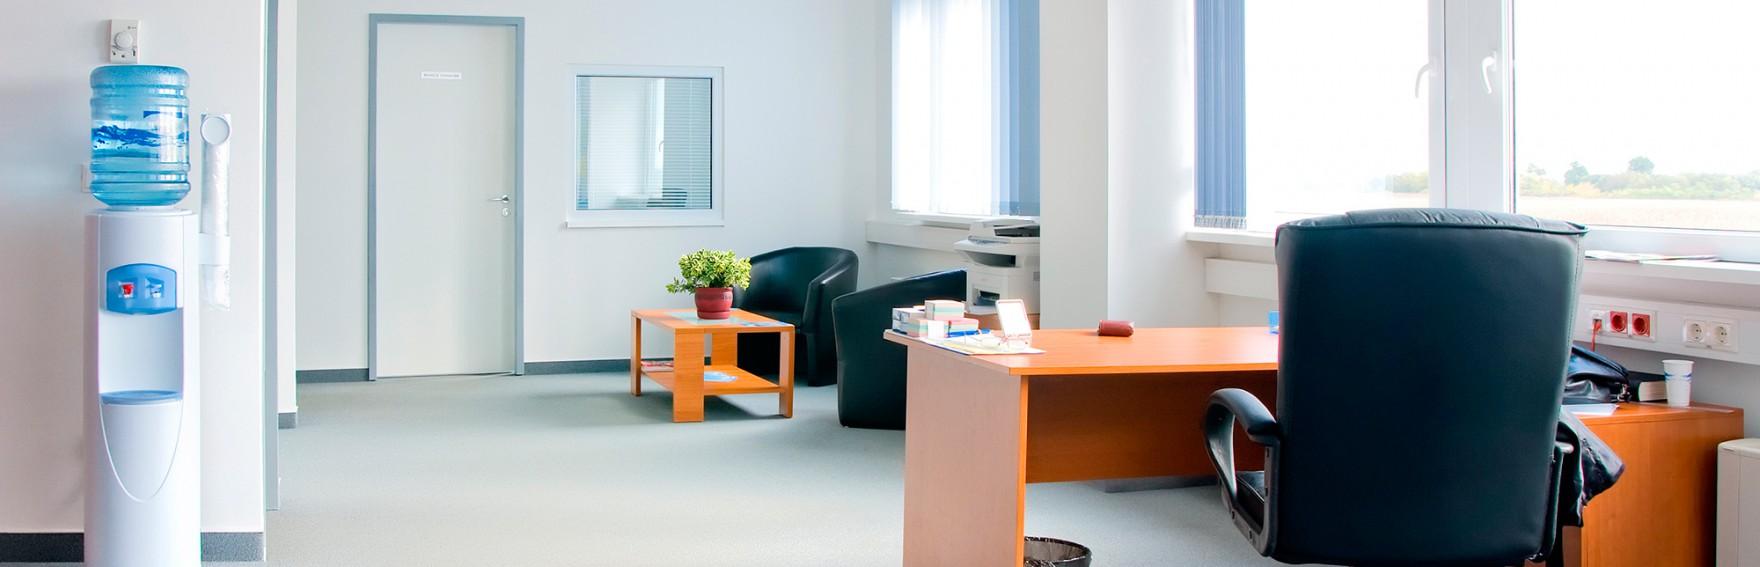 Bodrum Ec Otel İşyeri Temizlik